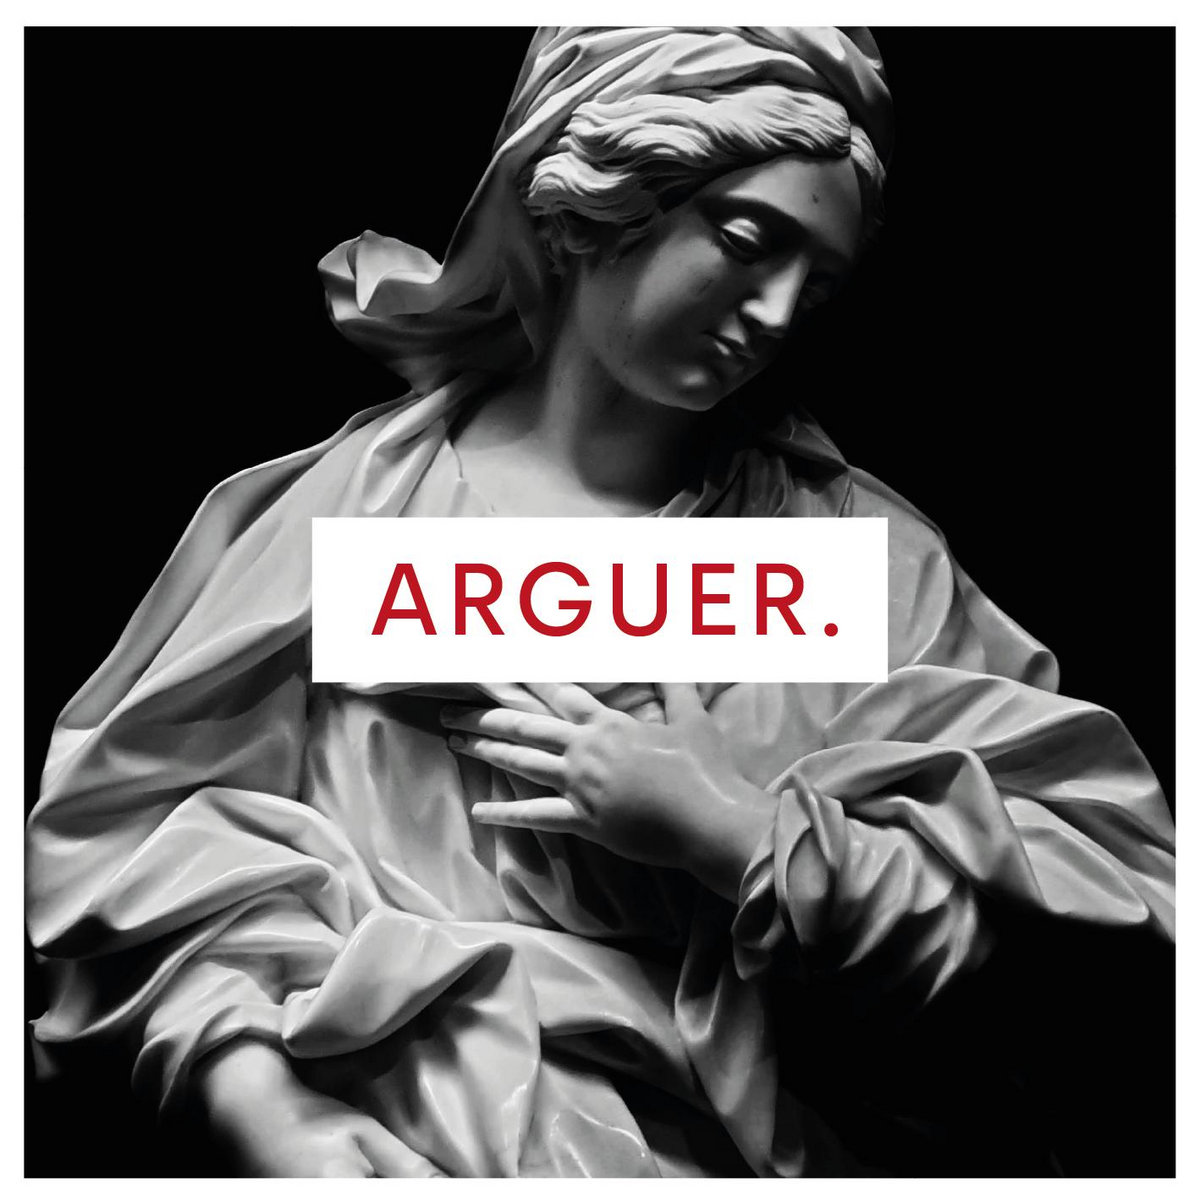 ARGUER